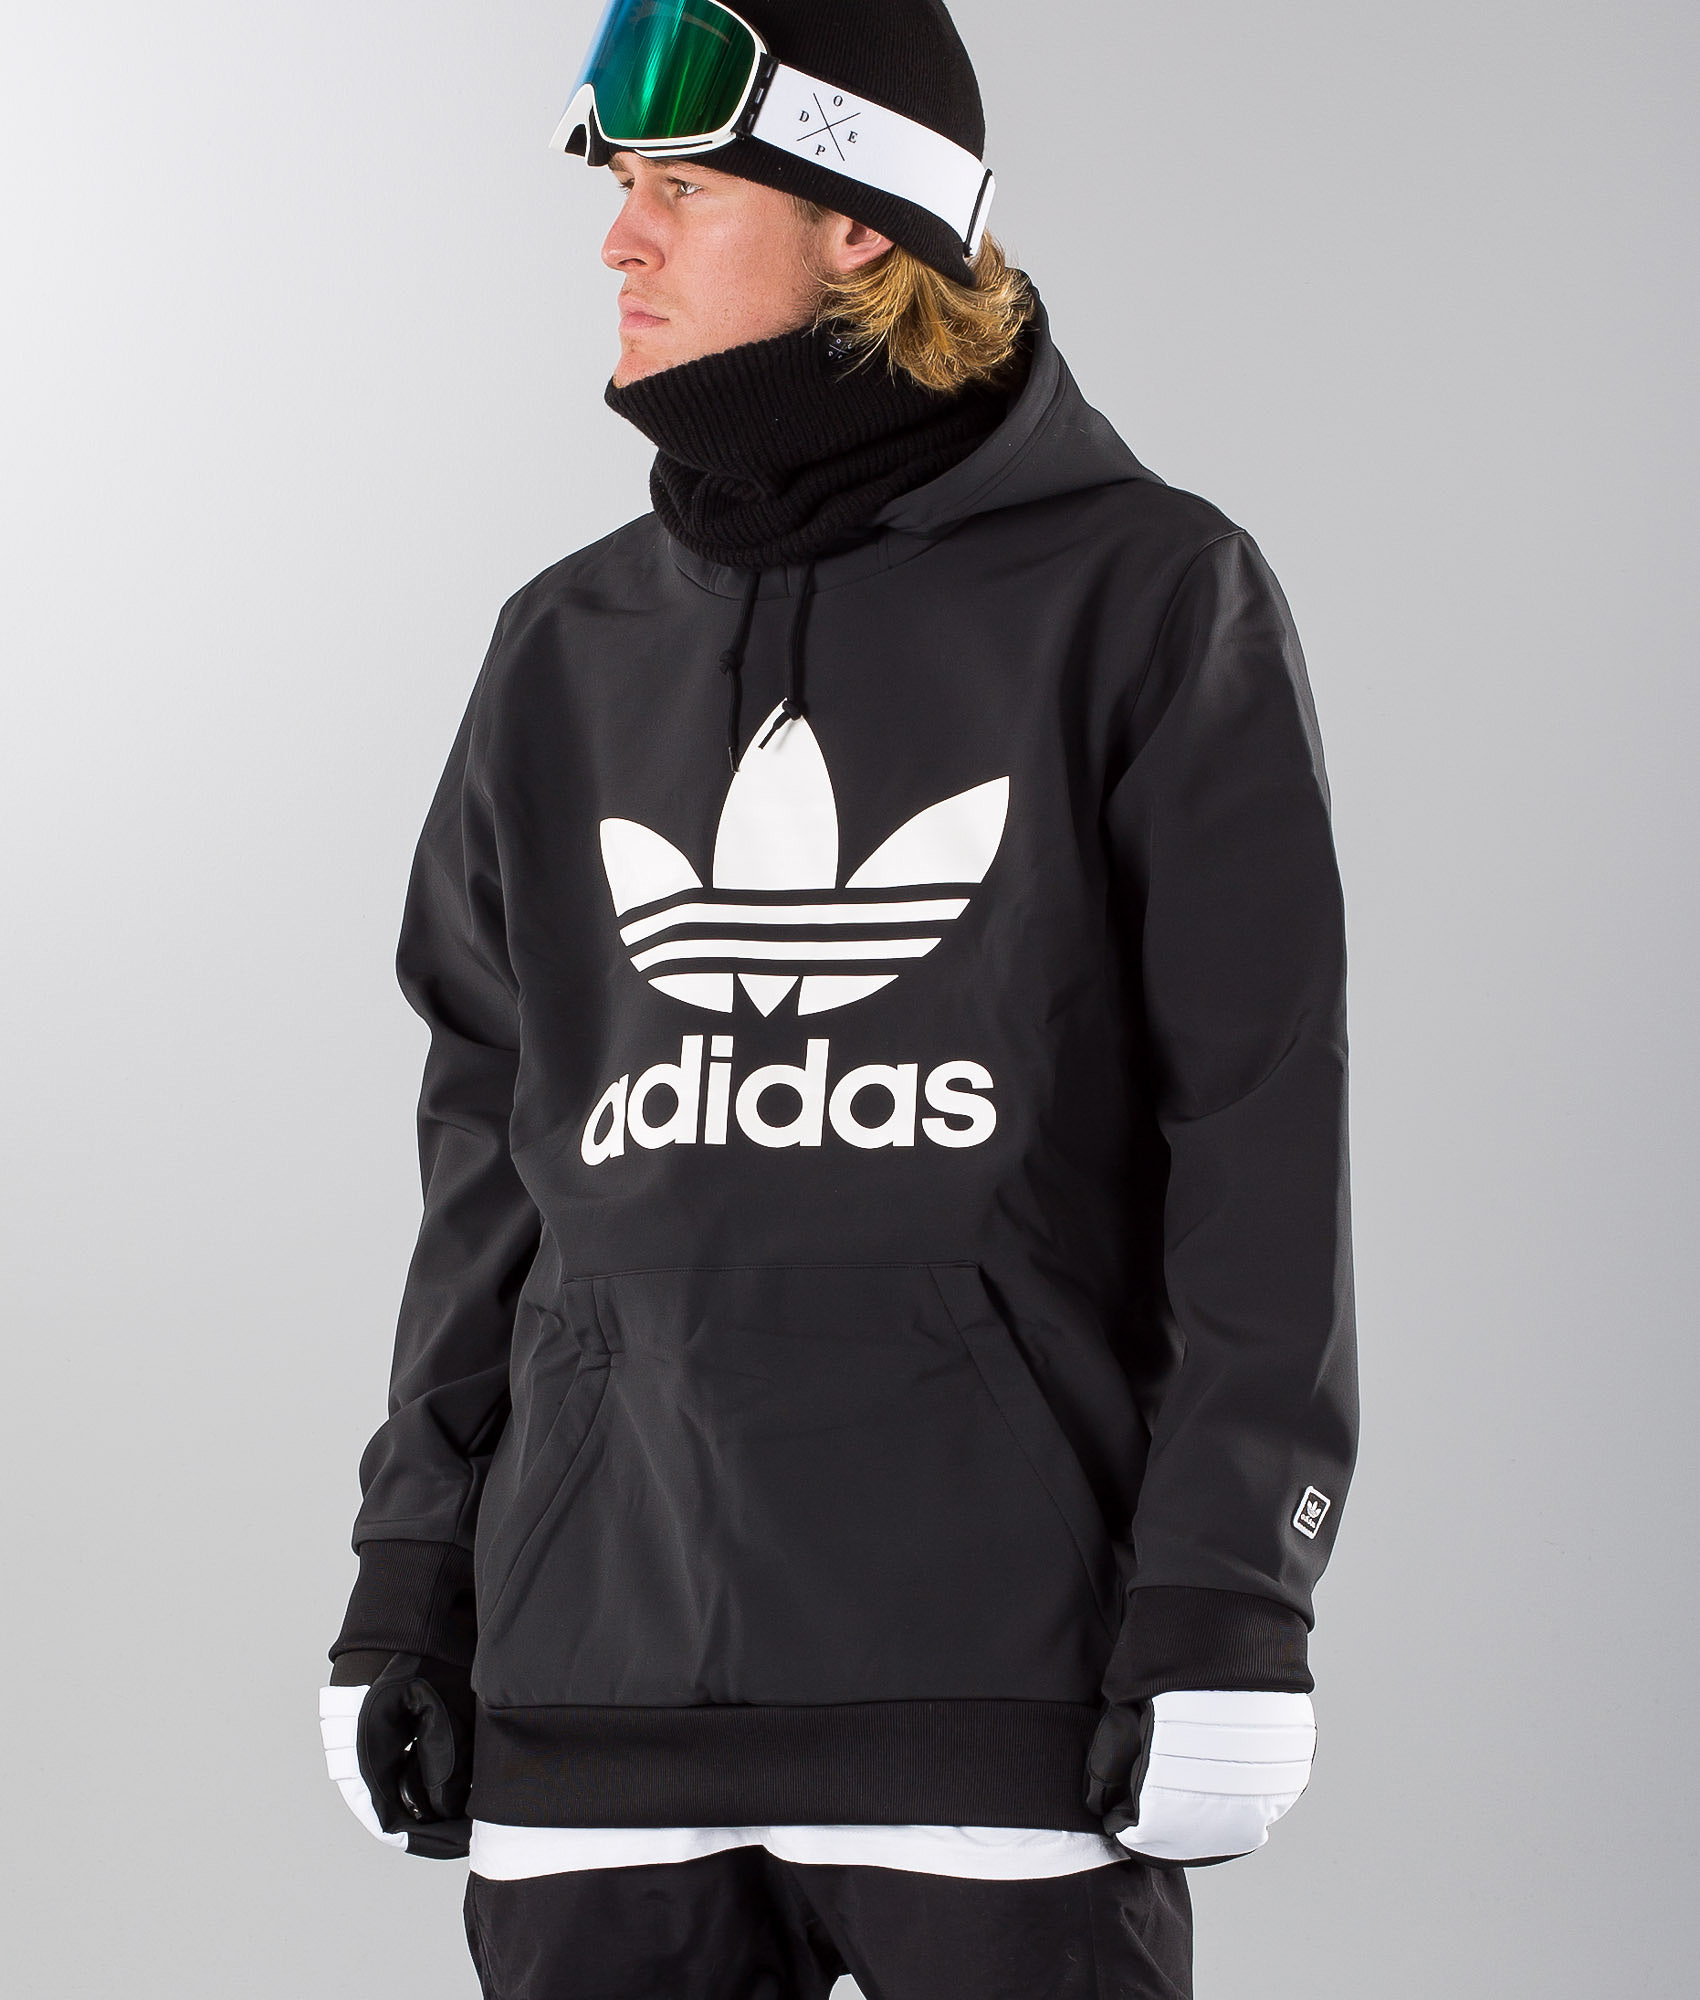 060066c8d4a7 Adidas Snowboarding Team Tech Snowboard Jacket Black White ...